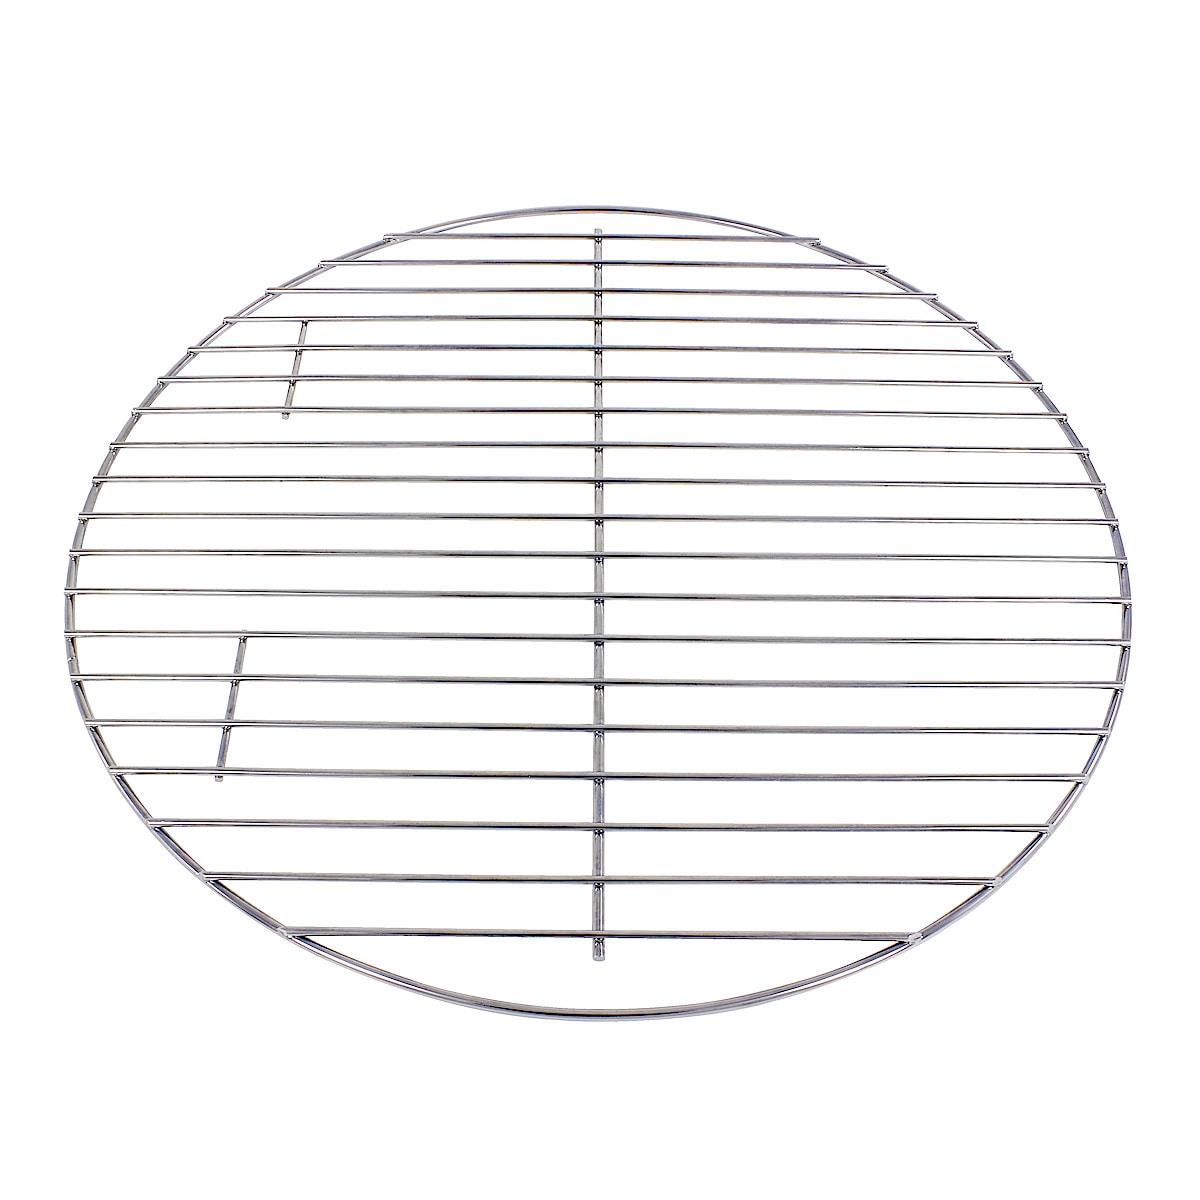 Grillrist 41,5 cm